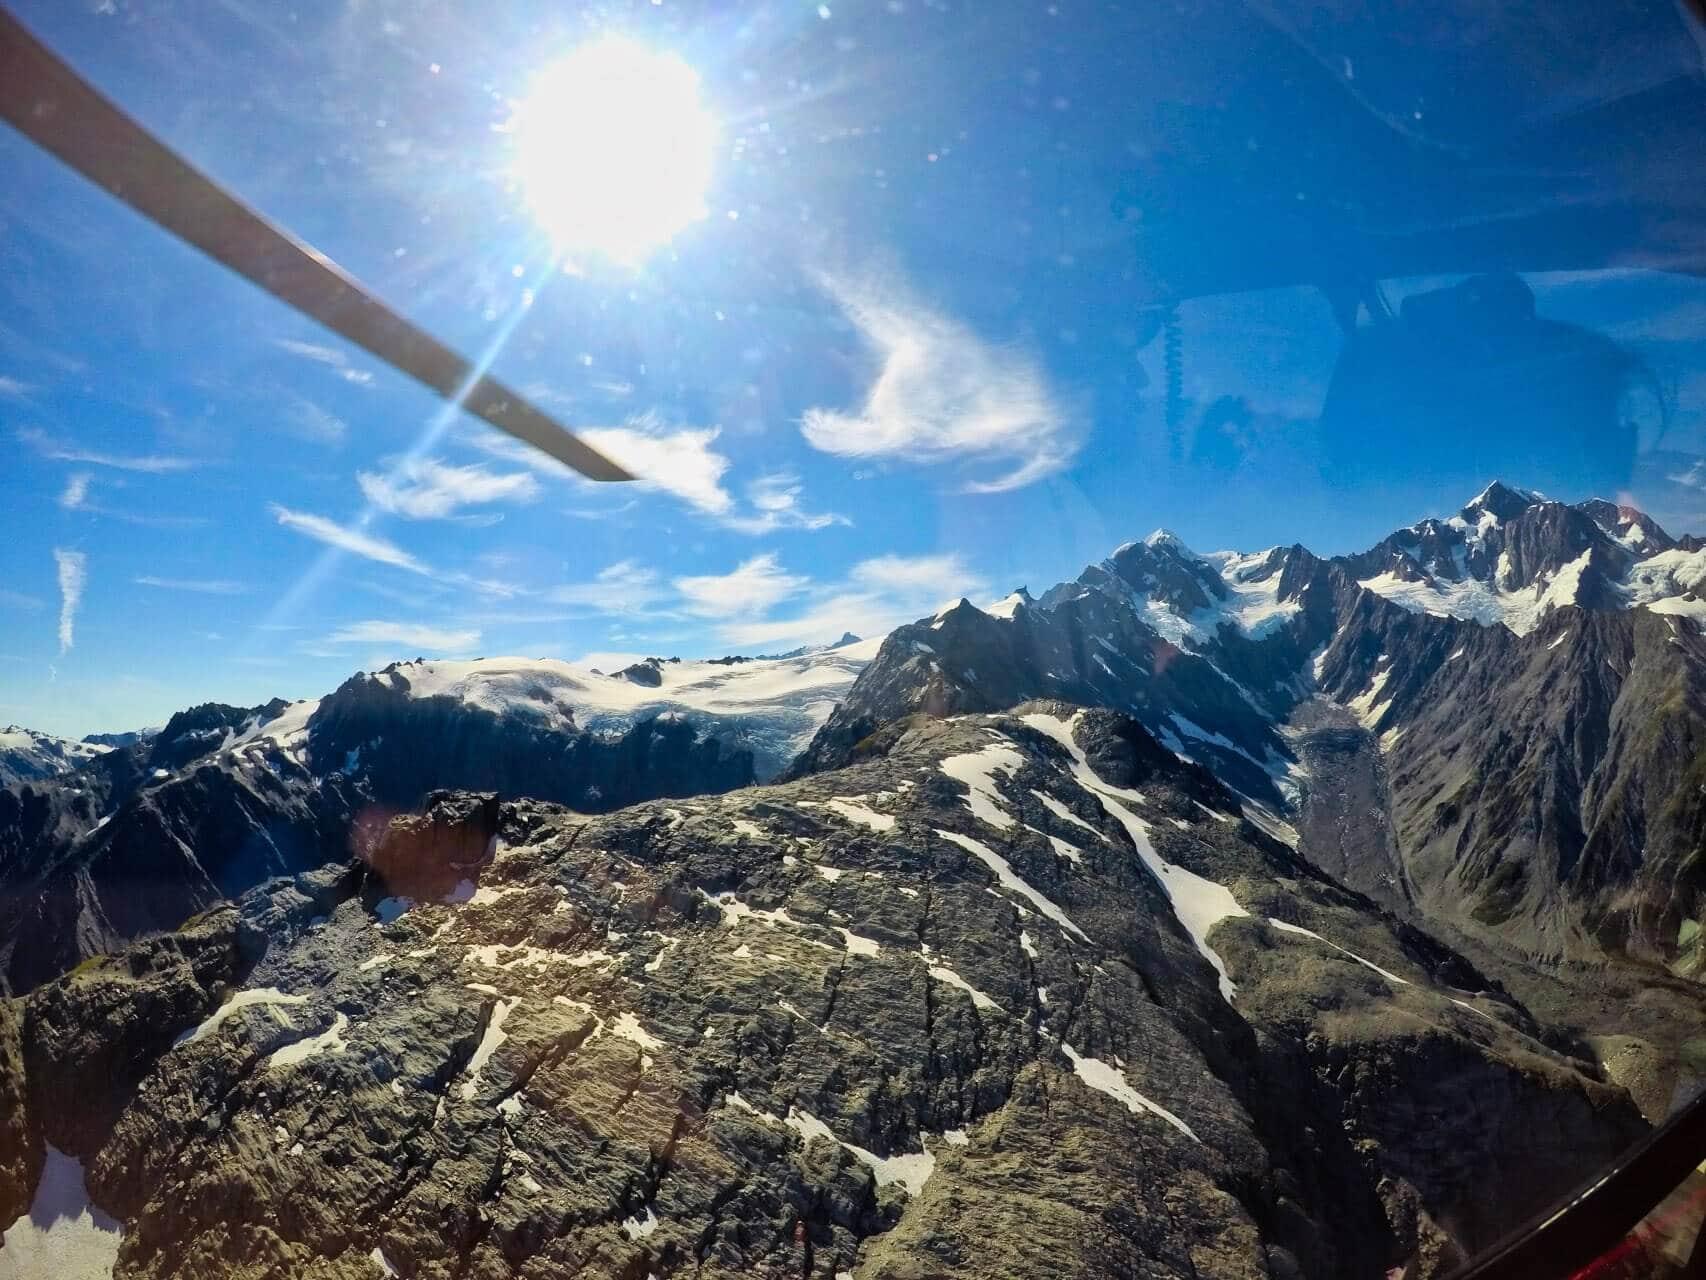 helicopte-window-view-fox-glacier